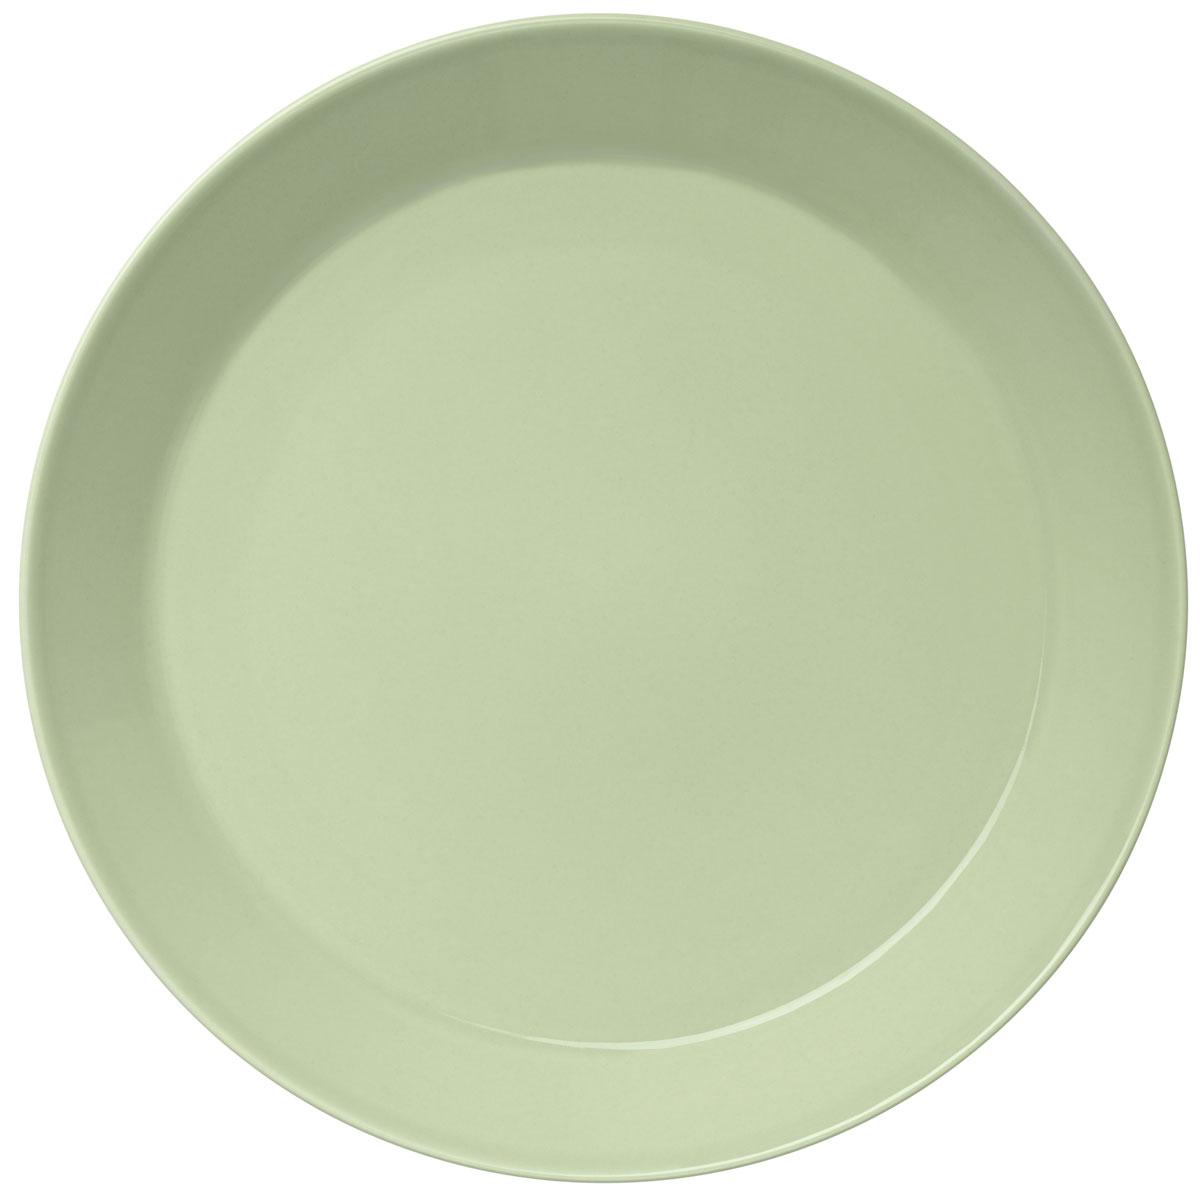 Тарелка Iittala Teema, цвет: зеленый, диаметр 26 см1005972